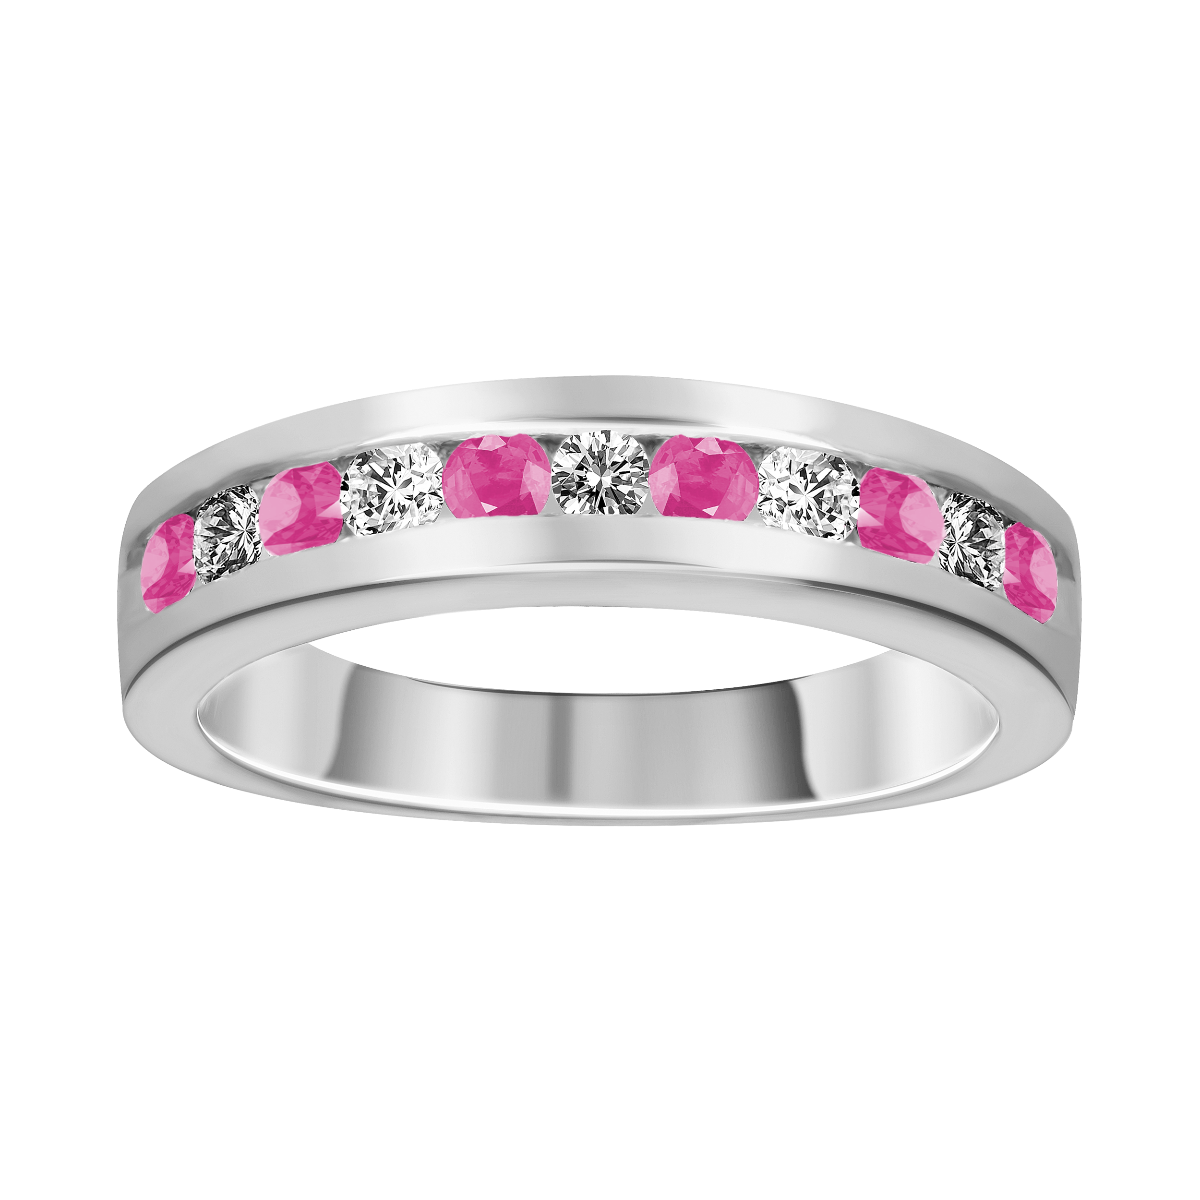 Anillo de zafiro rosa y diamantes oro blanco